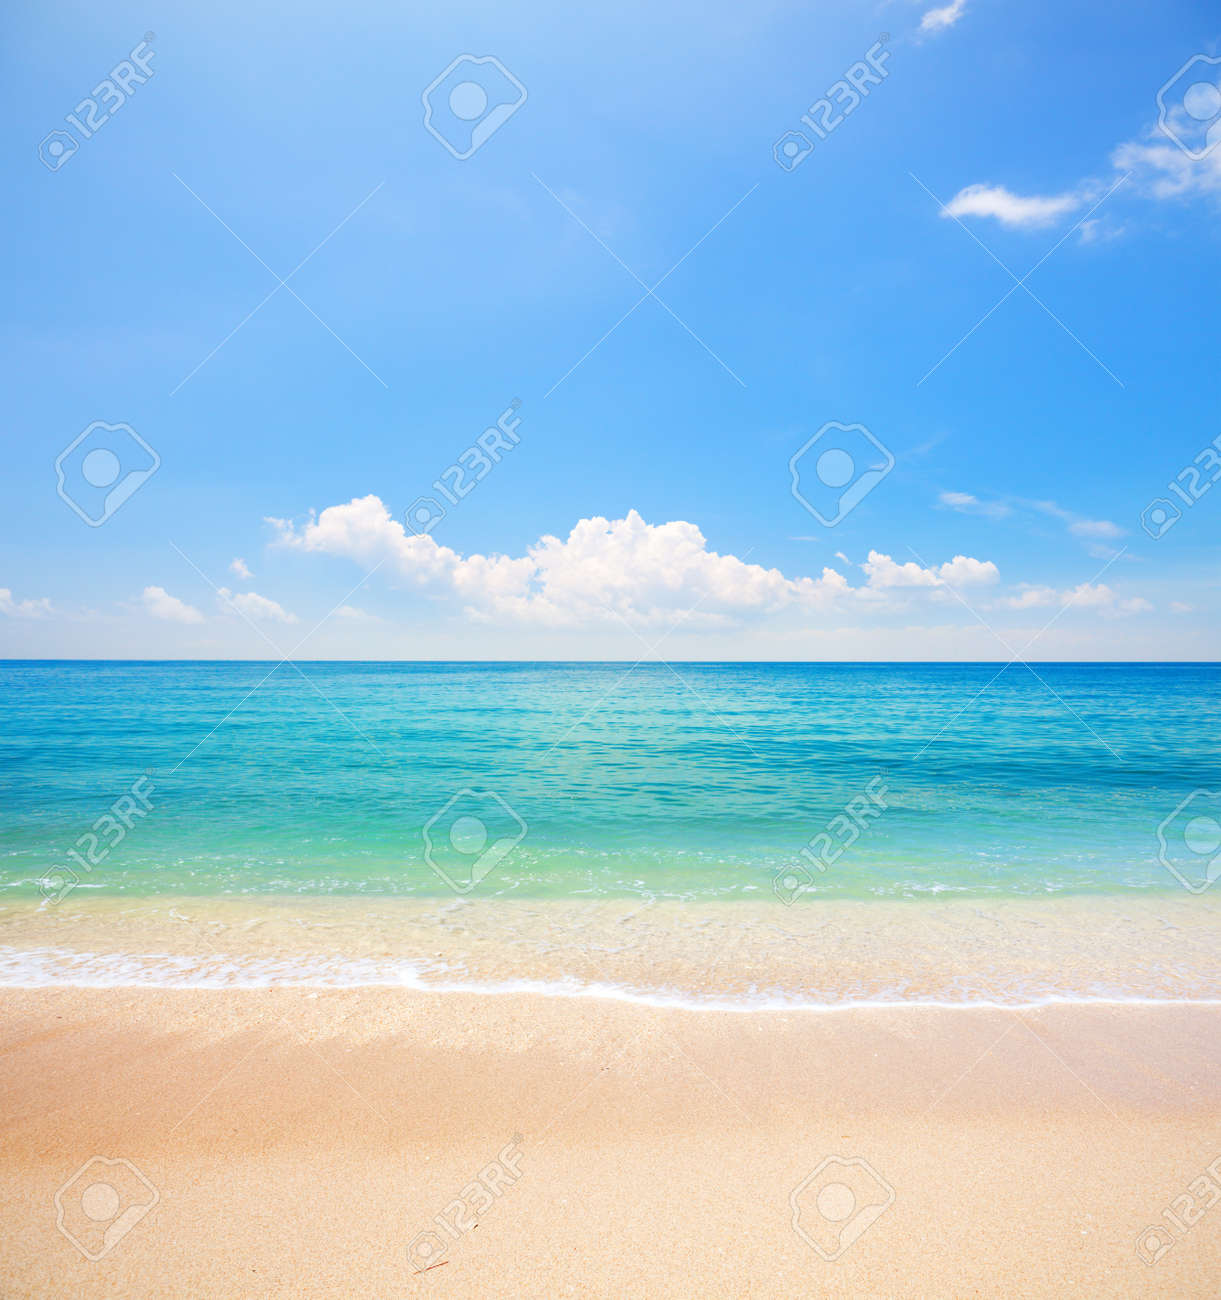 beach and tropical sea - 17336373